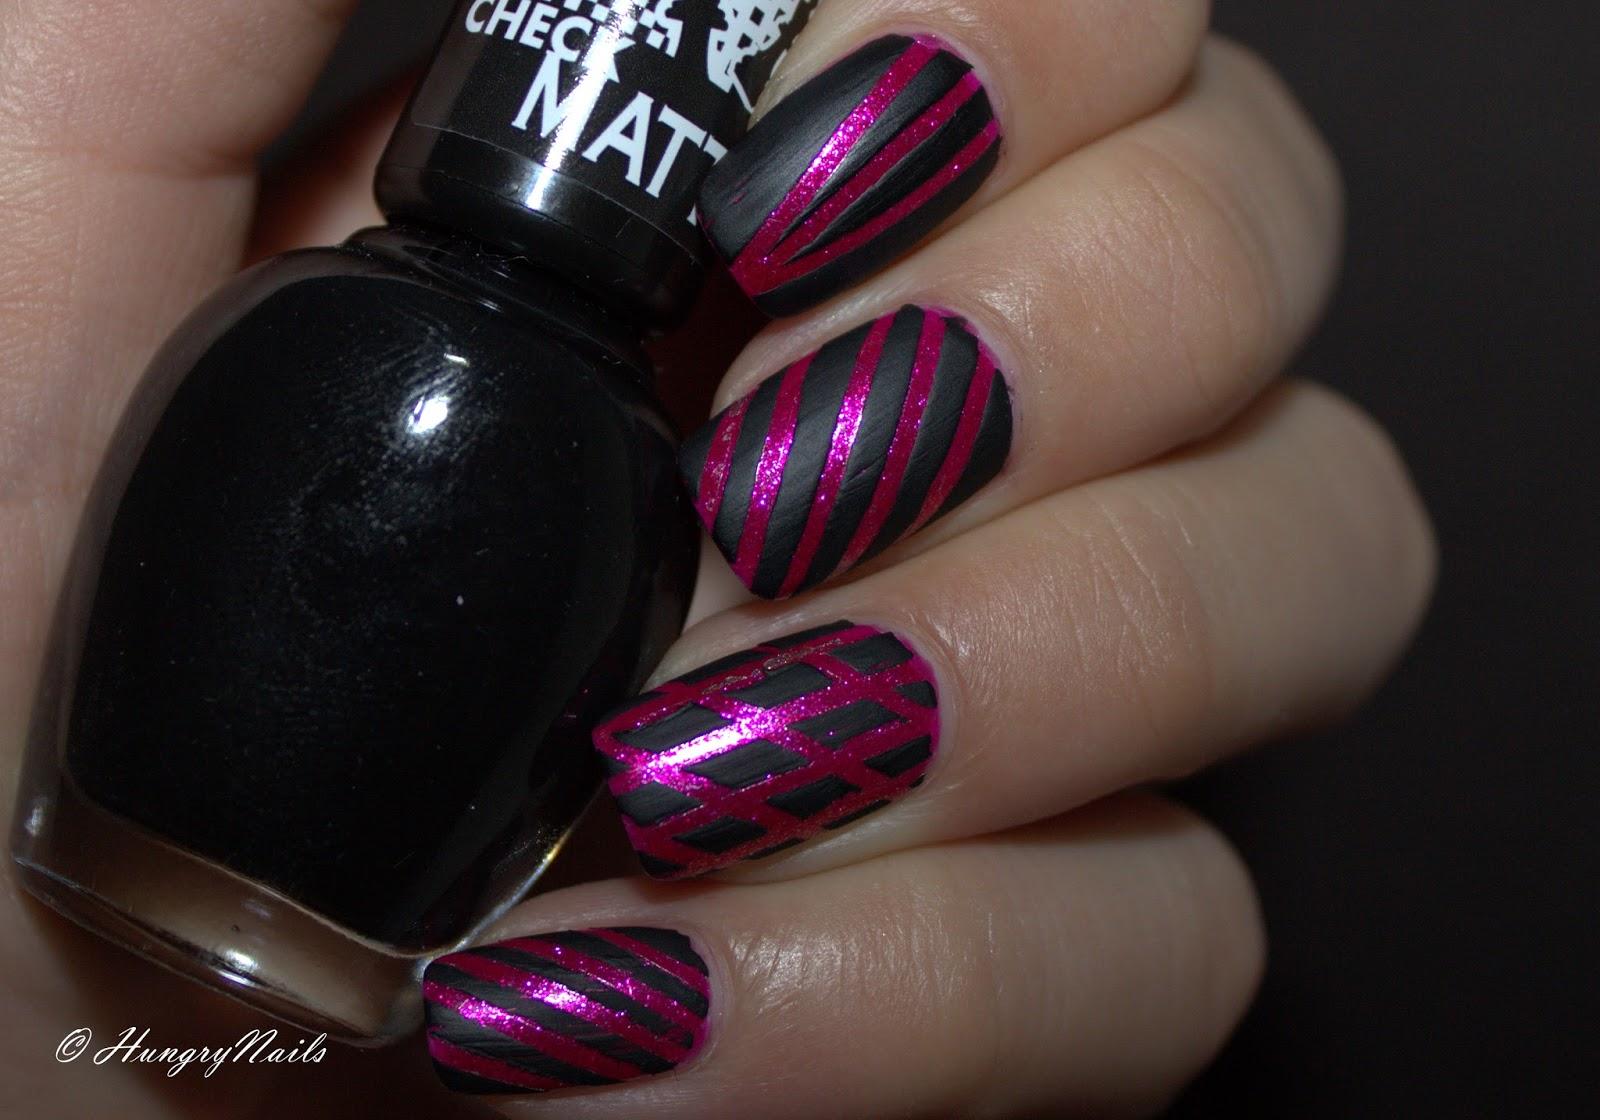 http://hungrynails.blogspot.de/2014/11/lacke-in-farbe-und-bunt-magenta.html